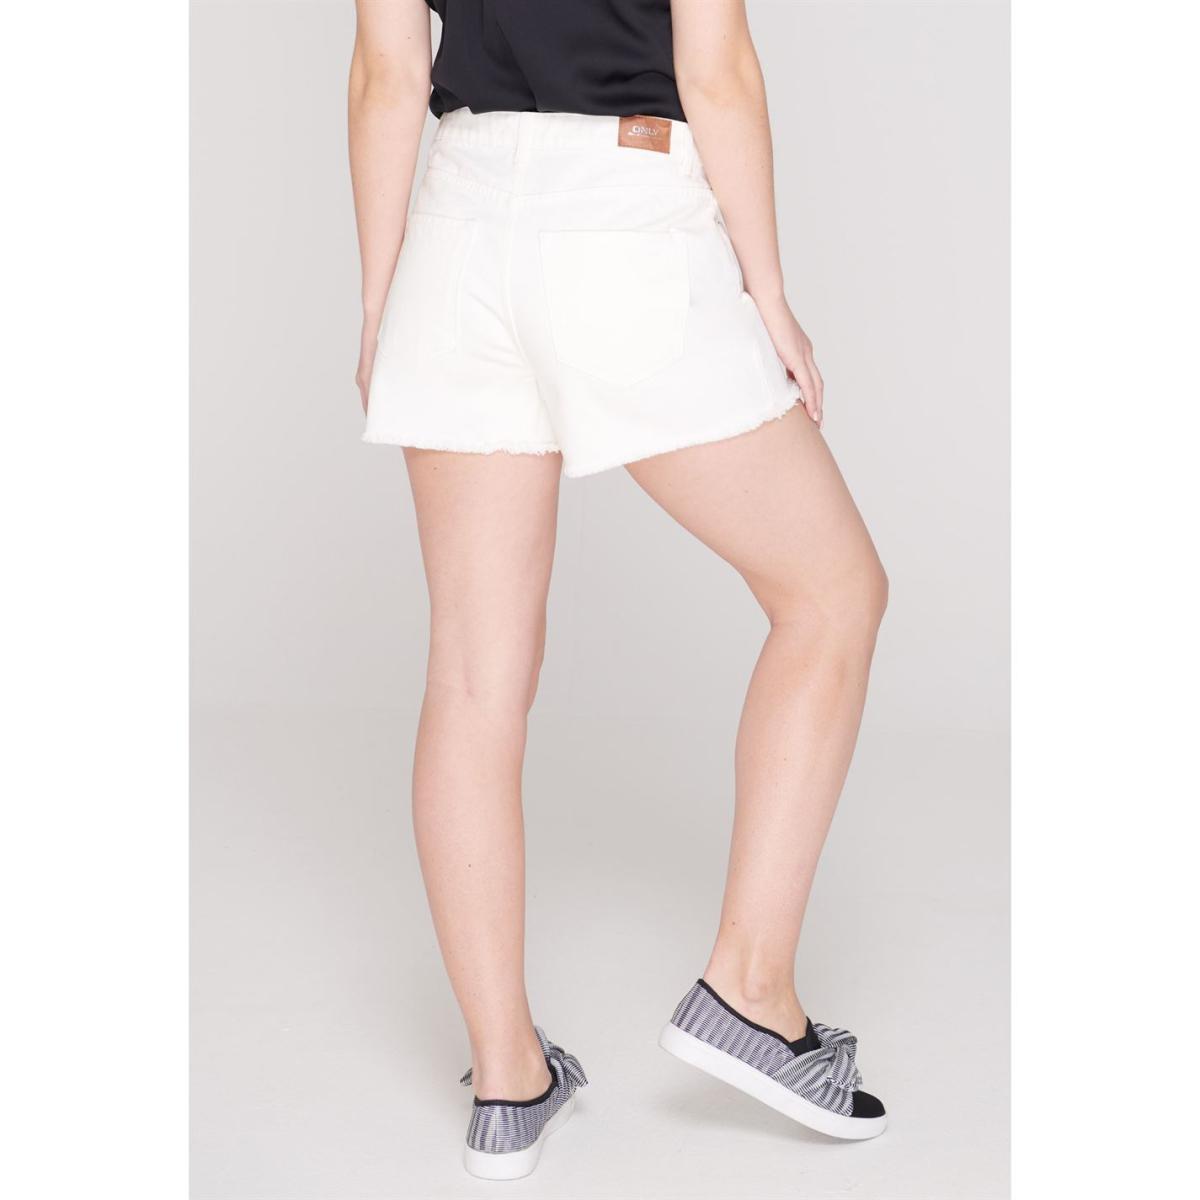 Only-Damen-Kurzhose-Shorts-Damenhose-Sporthose-Bermuda-Sommer-7093 Indexbild 9